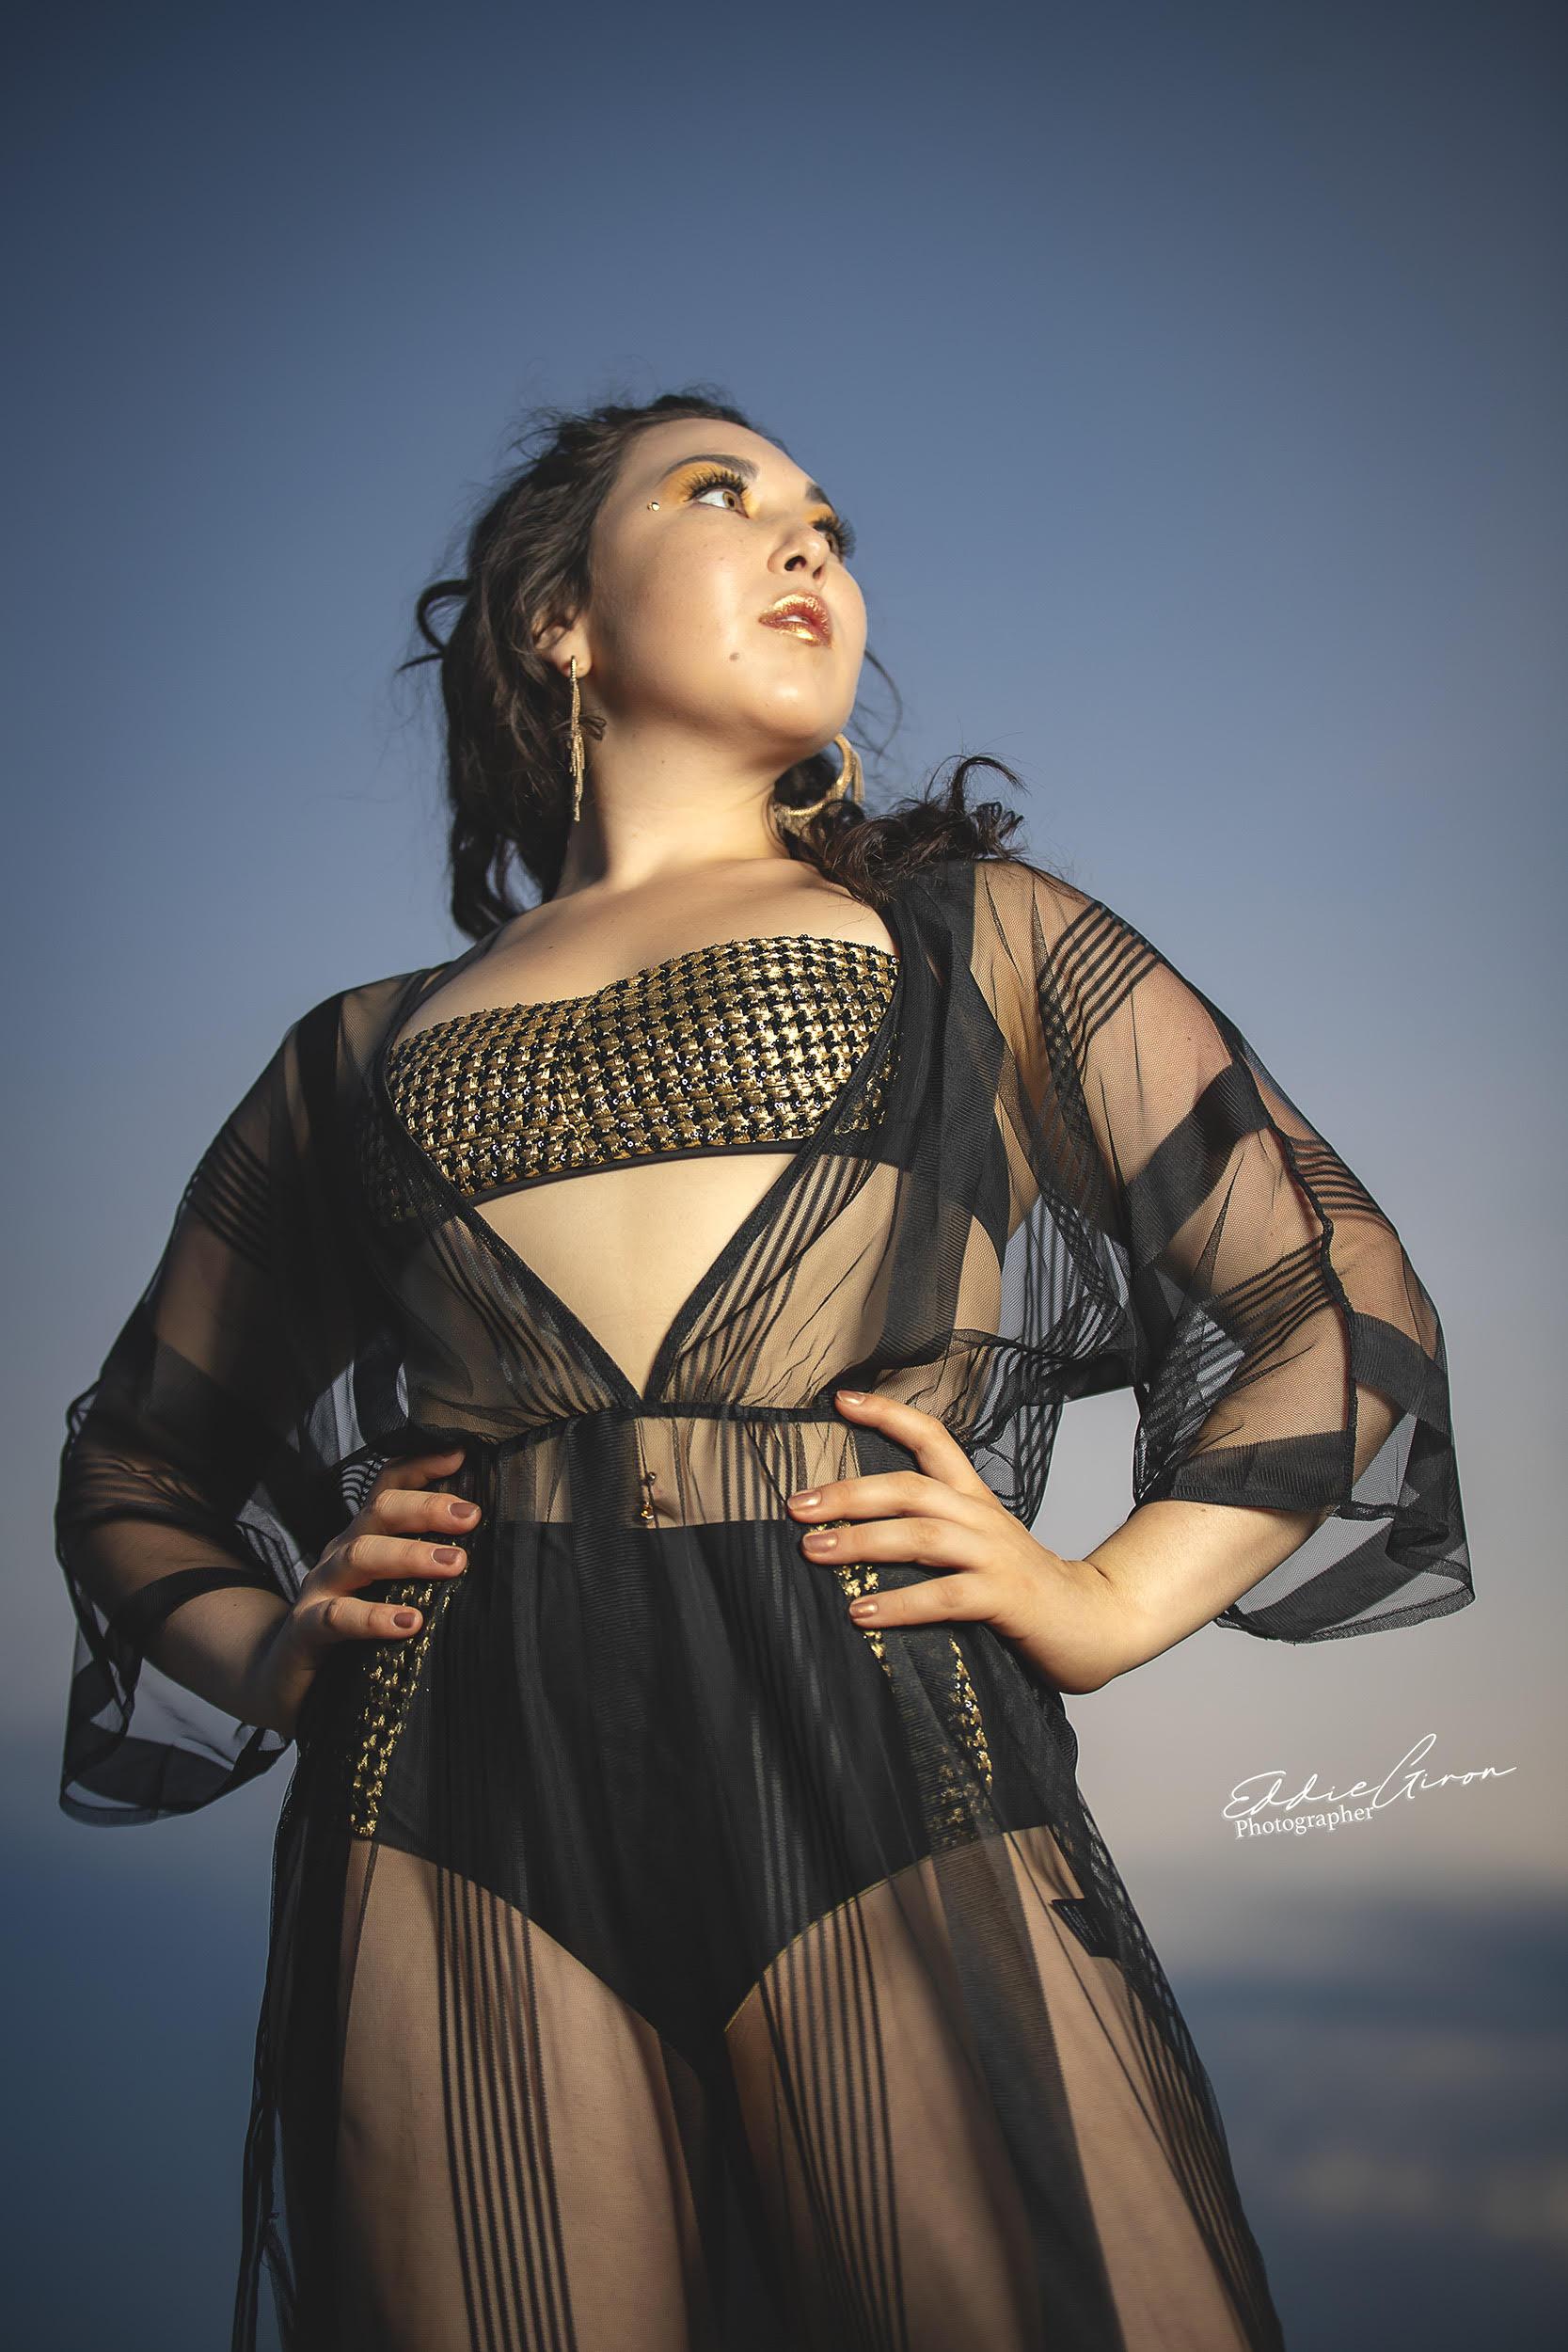 Eddie Giron Photography  Hair: Liliana Adames  Makeup: Veronica Arboleda